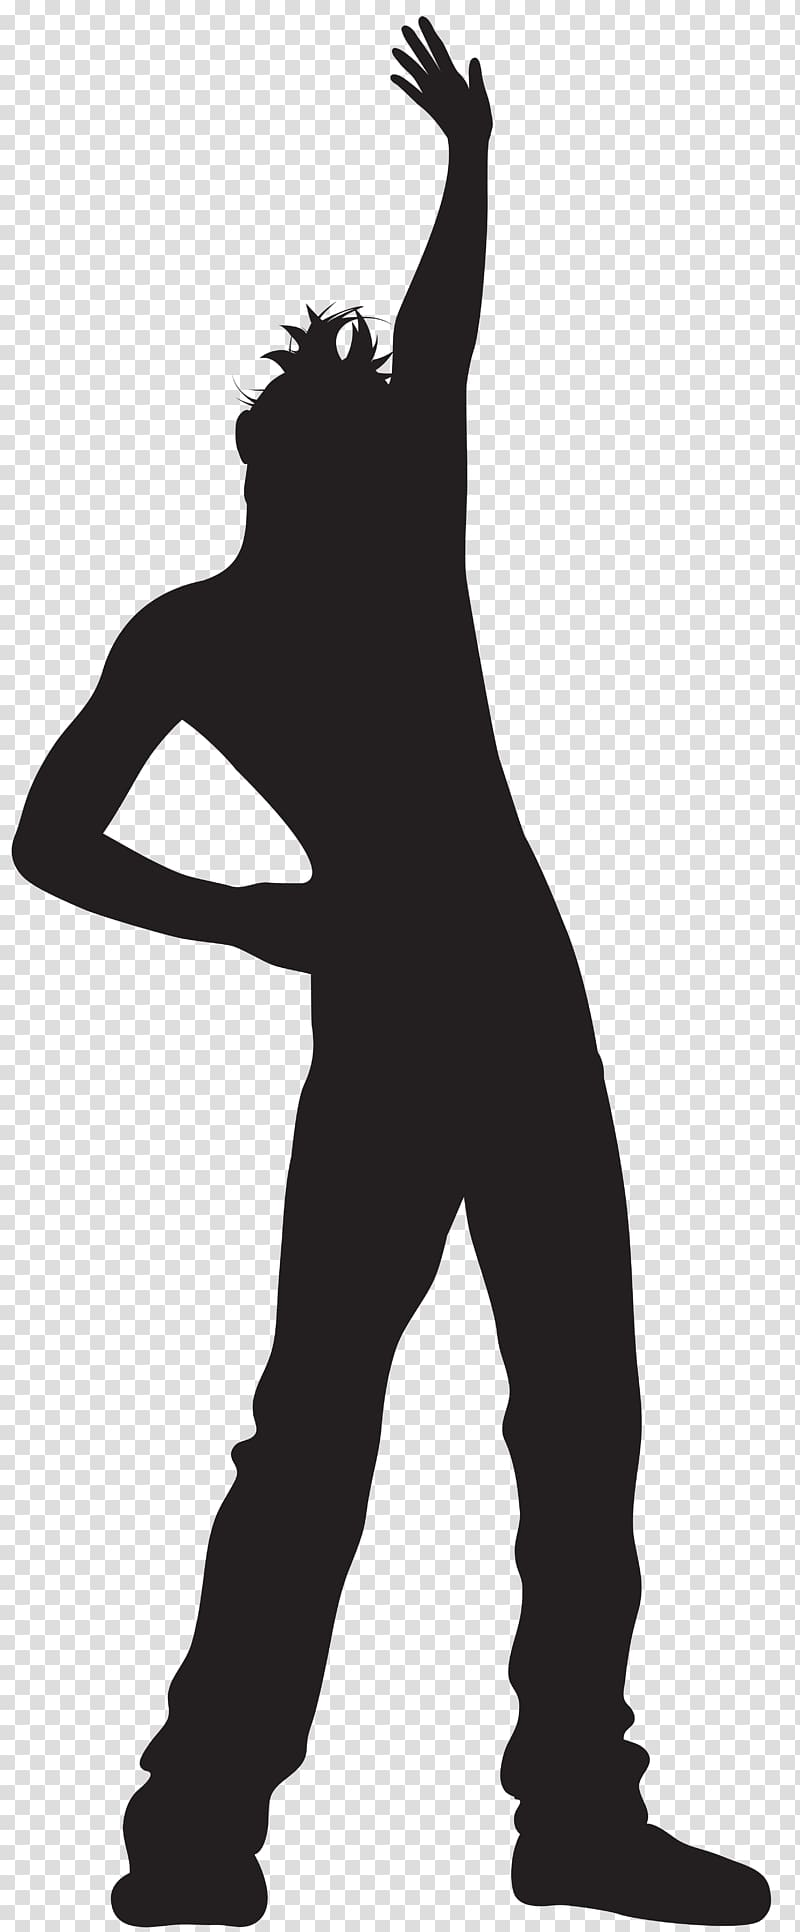 Silhouette of man ], Silhouette Dance , Dancing Man Silhouette.